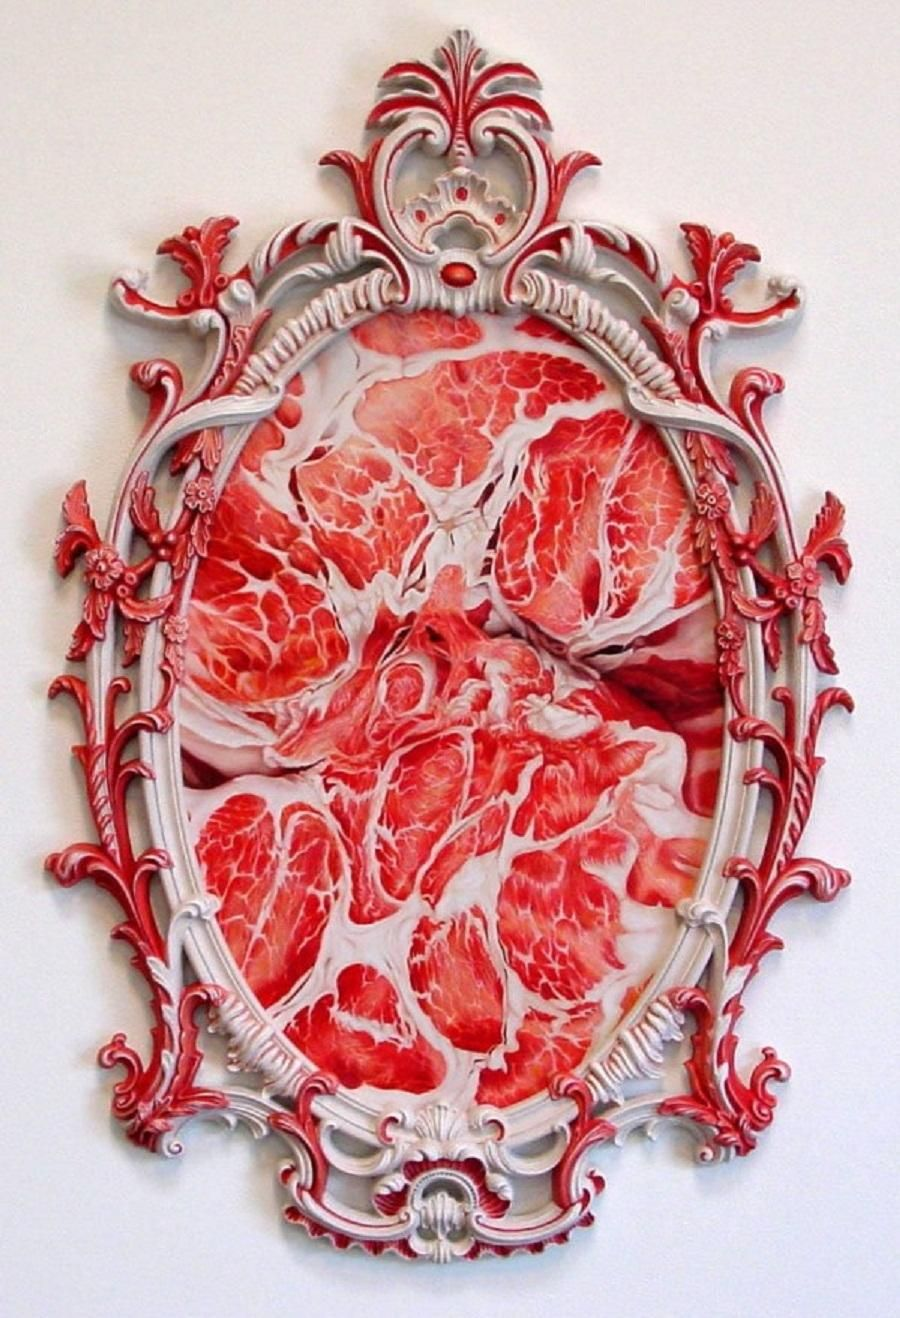 Victoria Reynolds - Flesh to Flora, 2010 - oil on panel